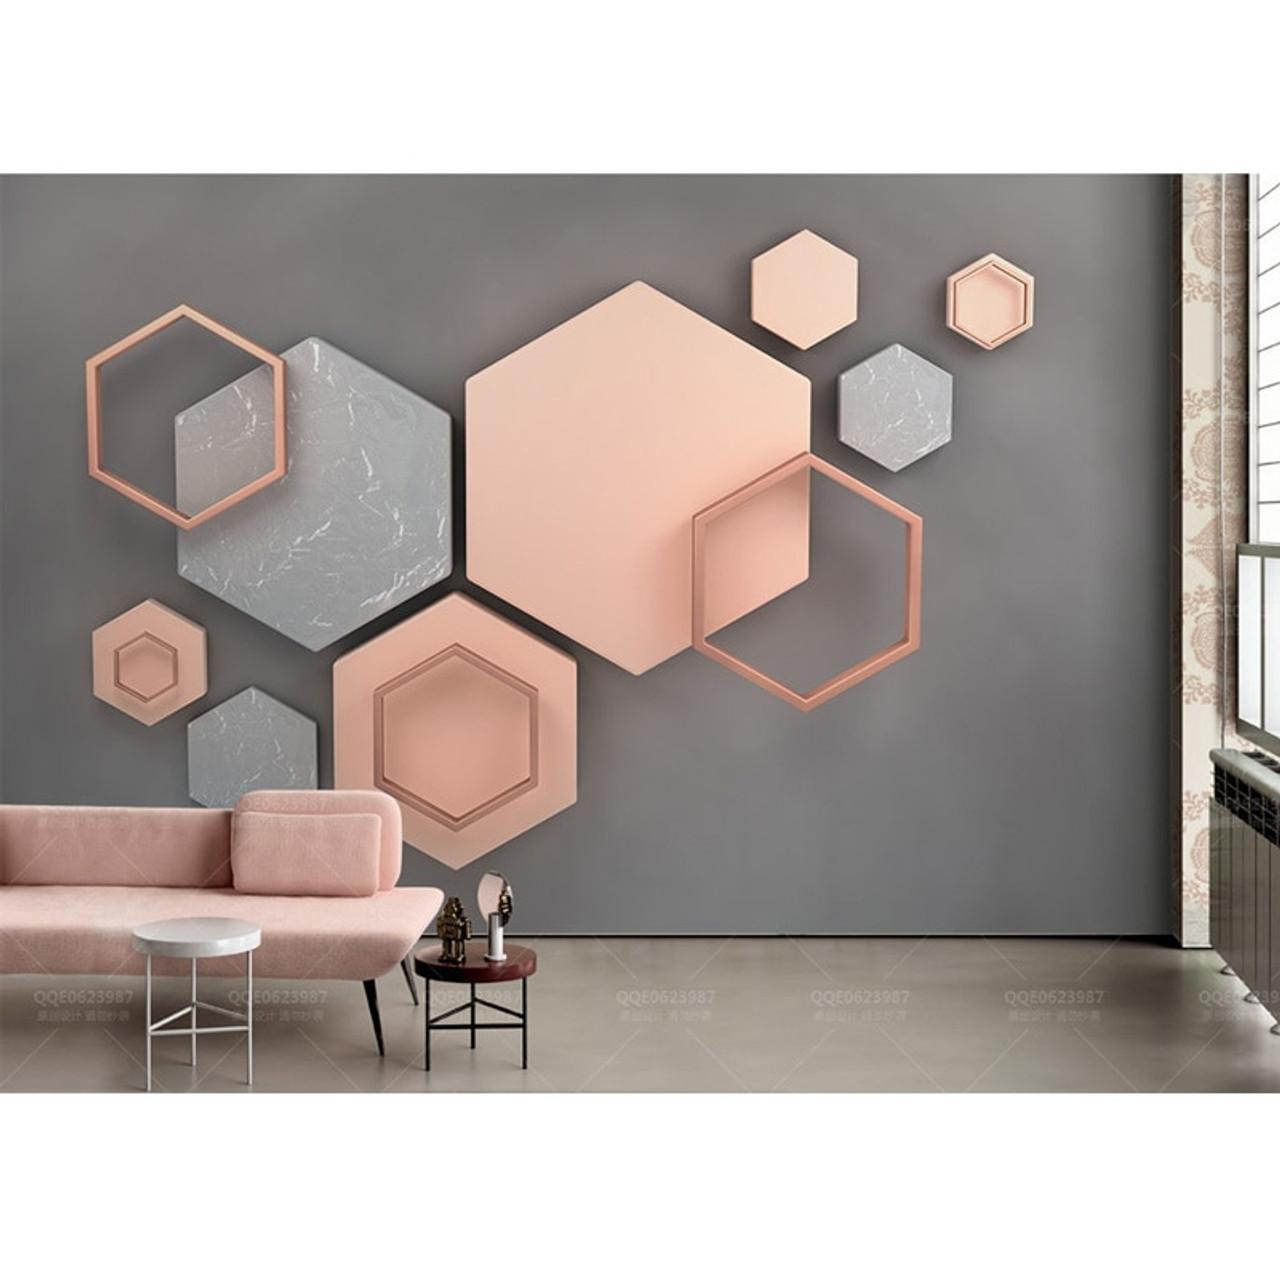 Home Decor Wall Papers Stickers Modern 3d Geometric Photo Wallpaper Mural Living Room Bedroom Self Adhesive Vinylsilk Wallpaper